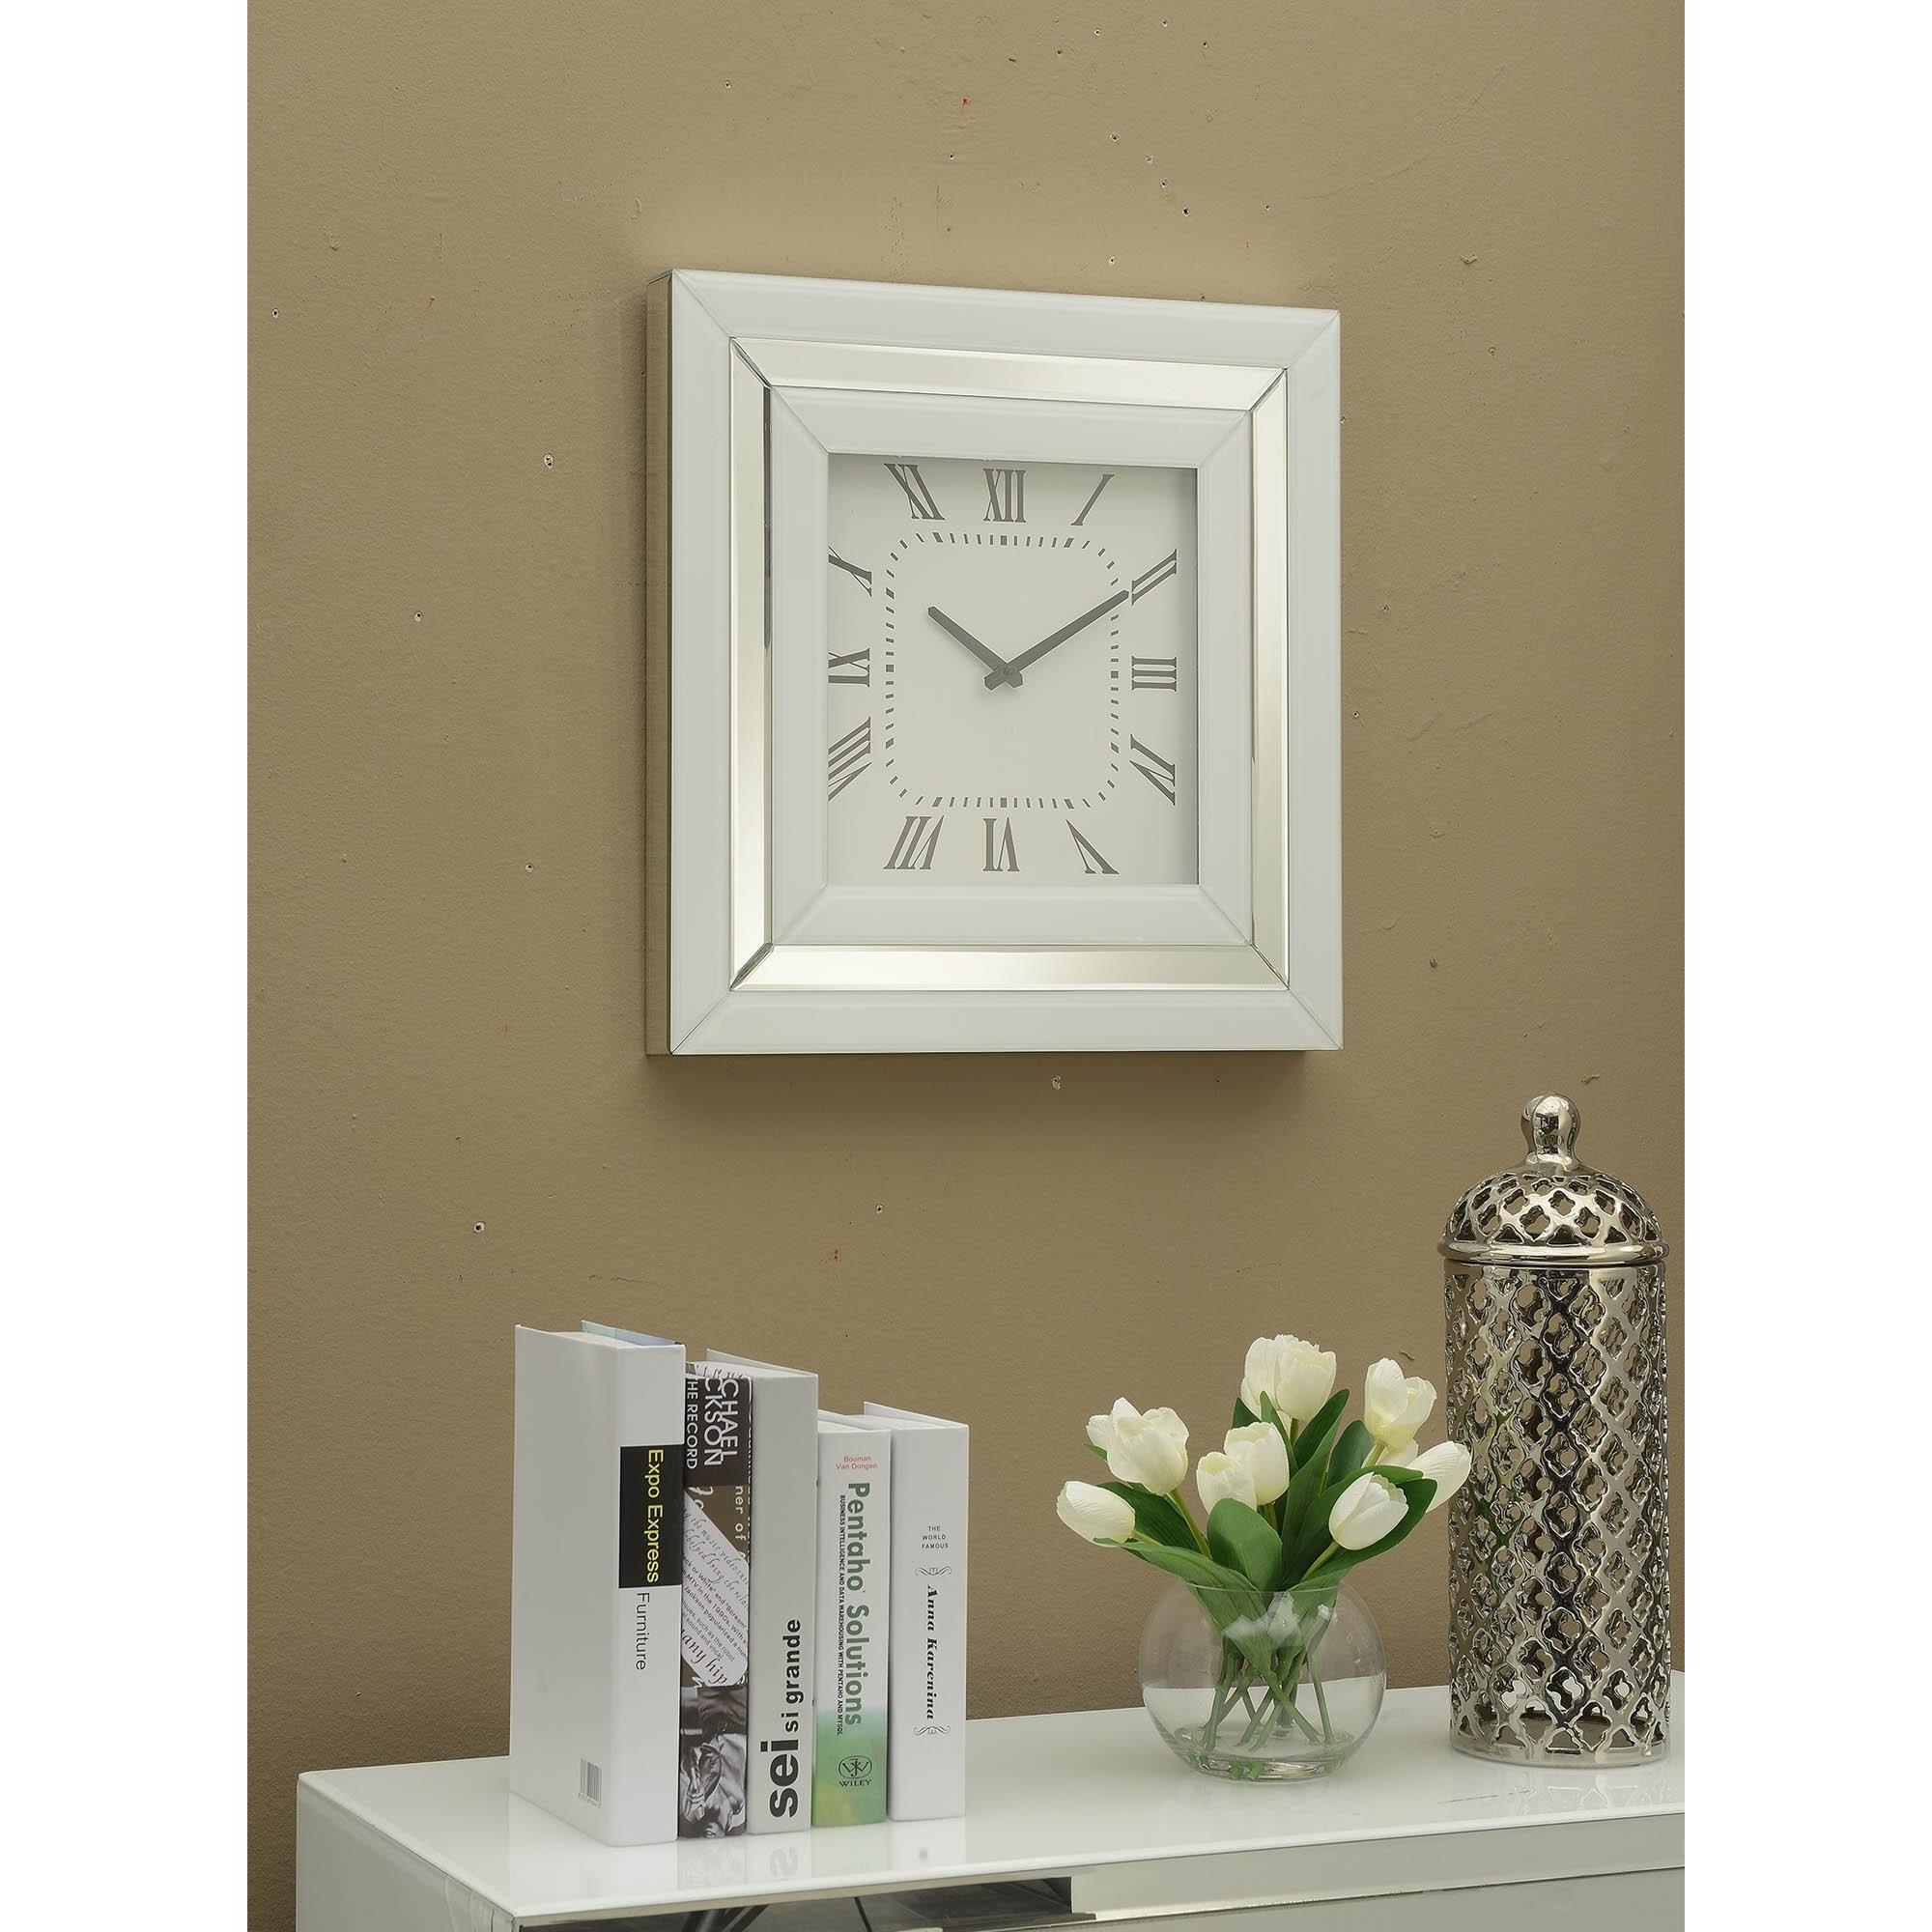 Malibu Mirrored Wall Clock Wall Clock Homesdirect365